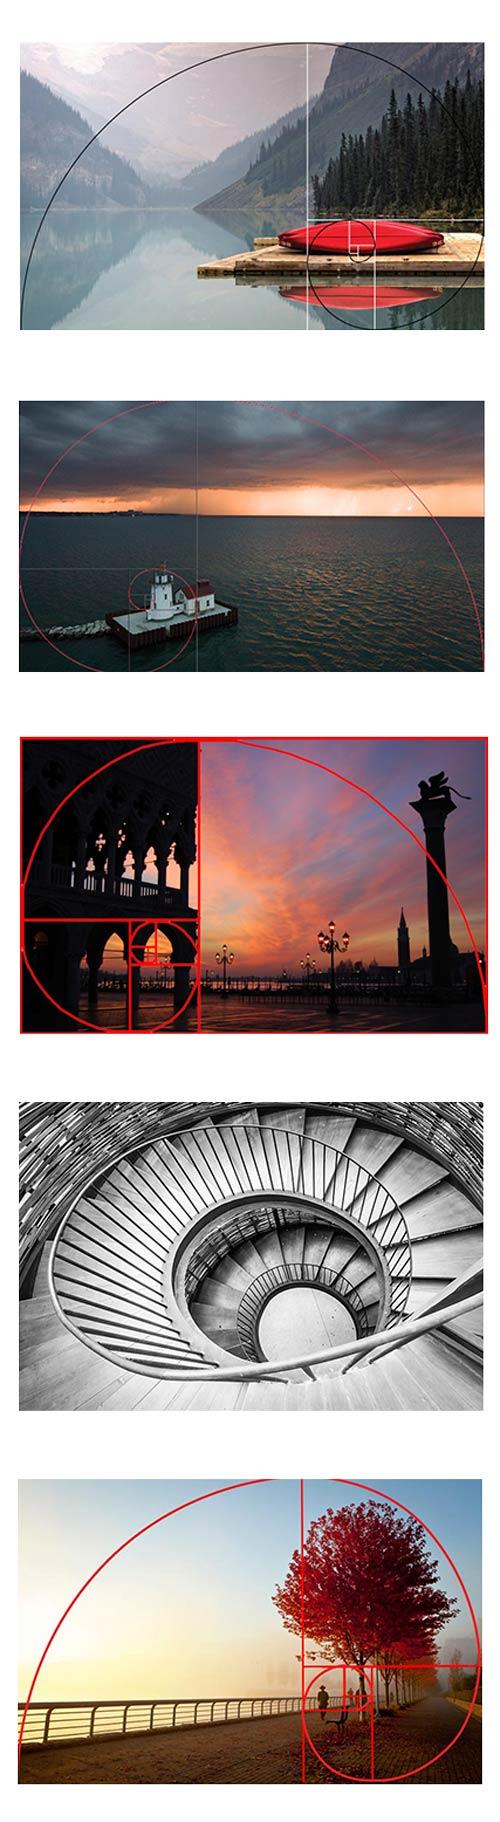 golden spiral photo - نسبت طلایی در عکاسی